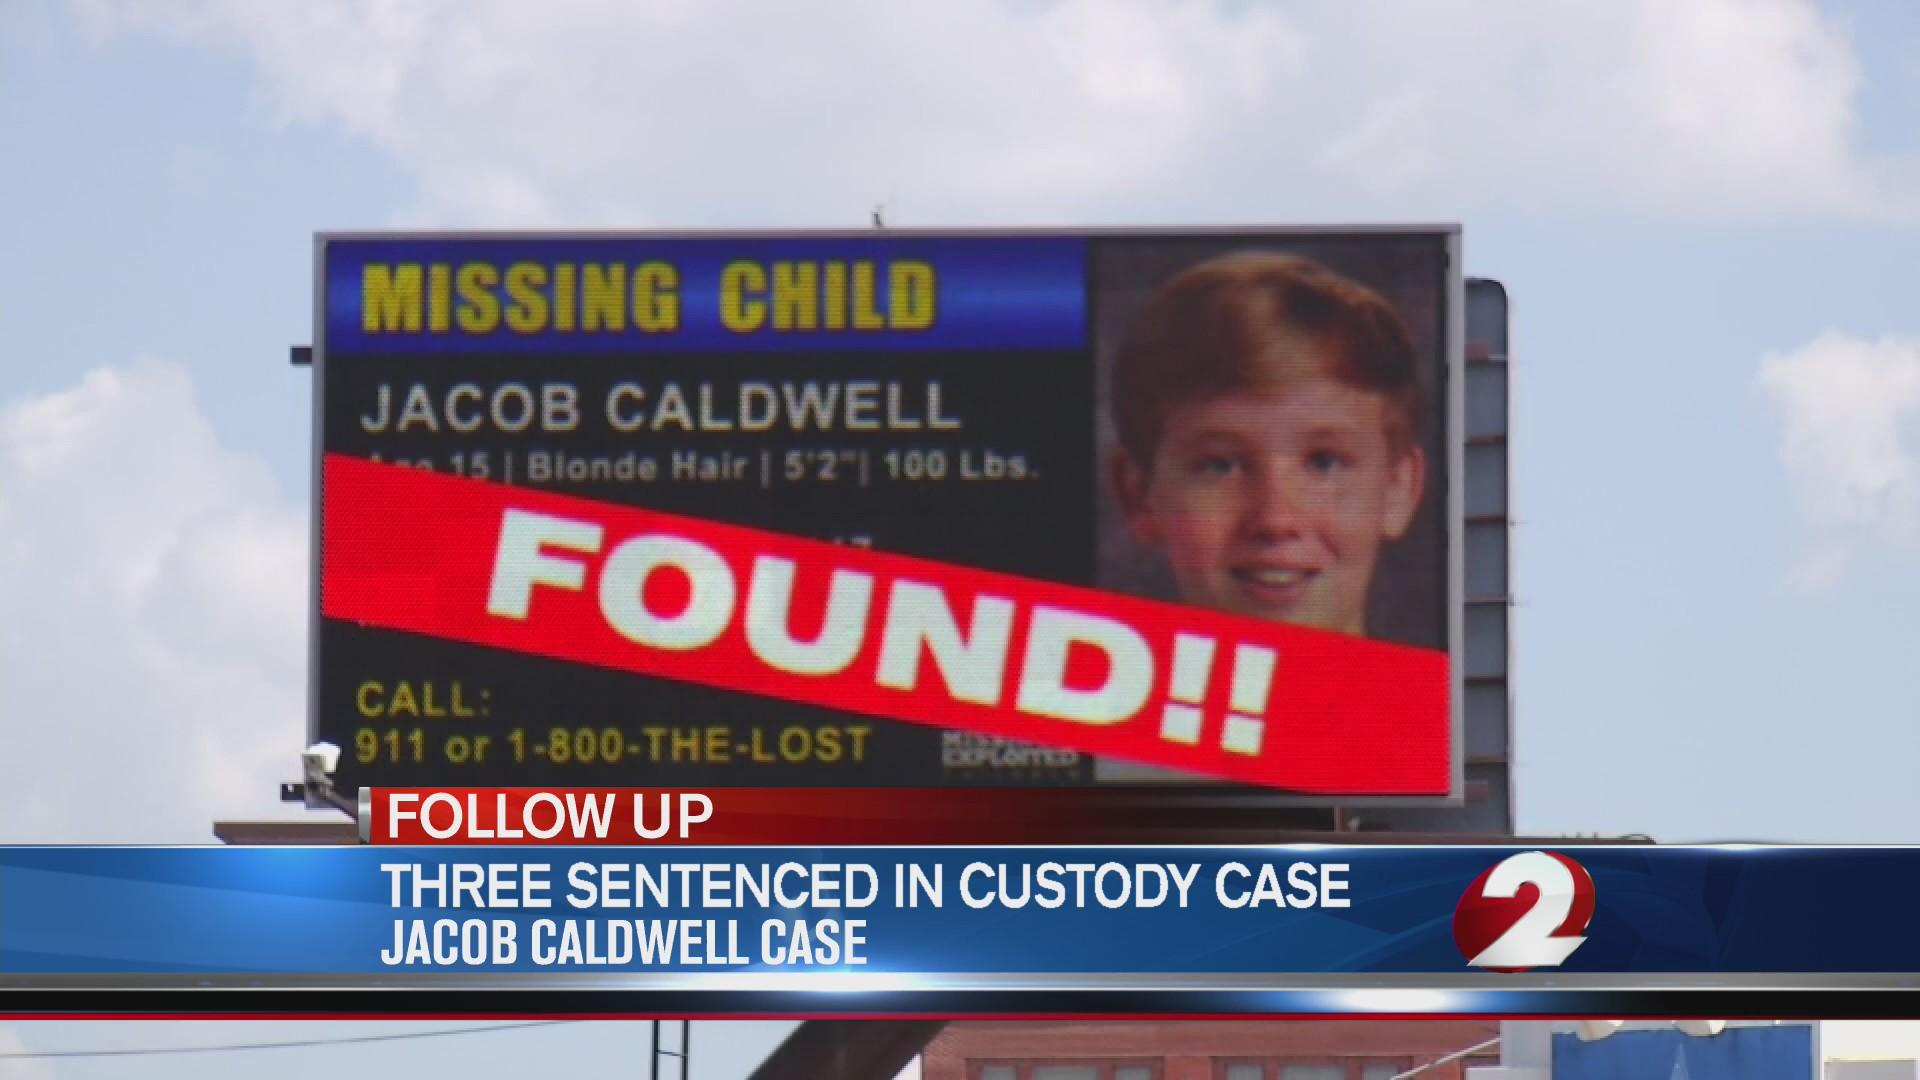 Three sentenced in Jacob Caldwell case